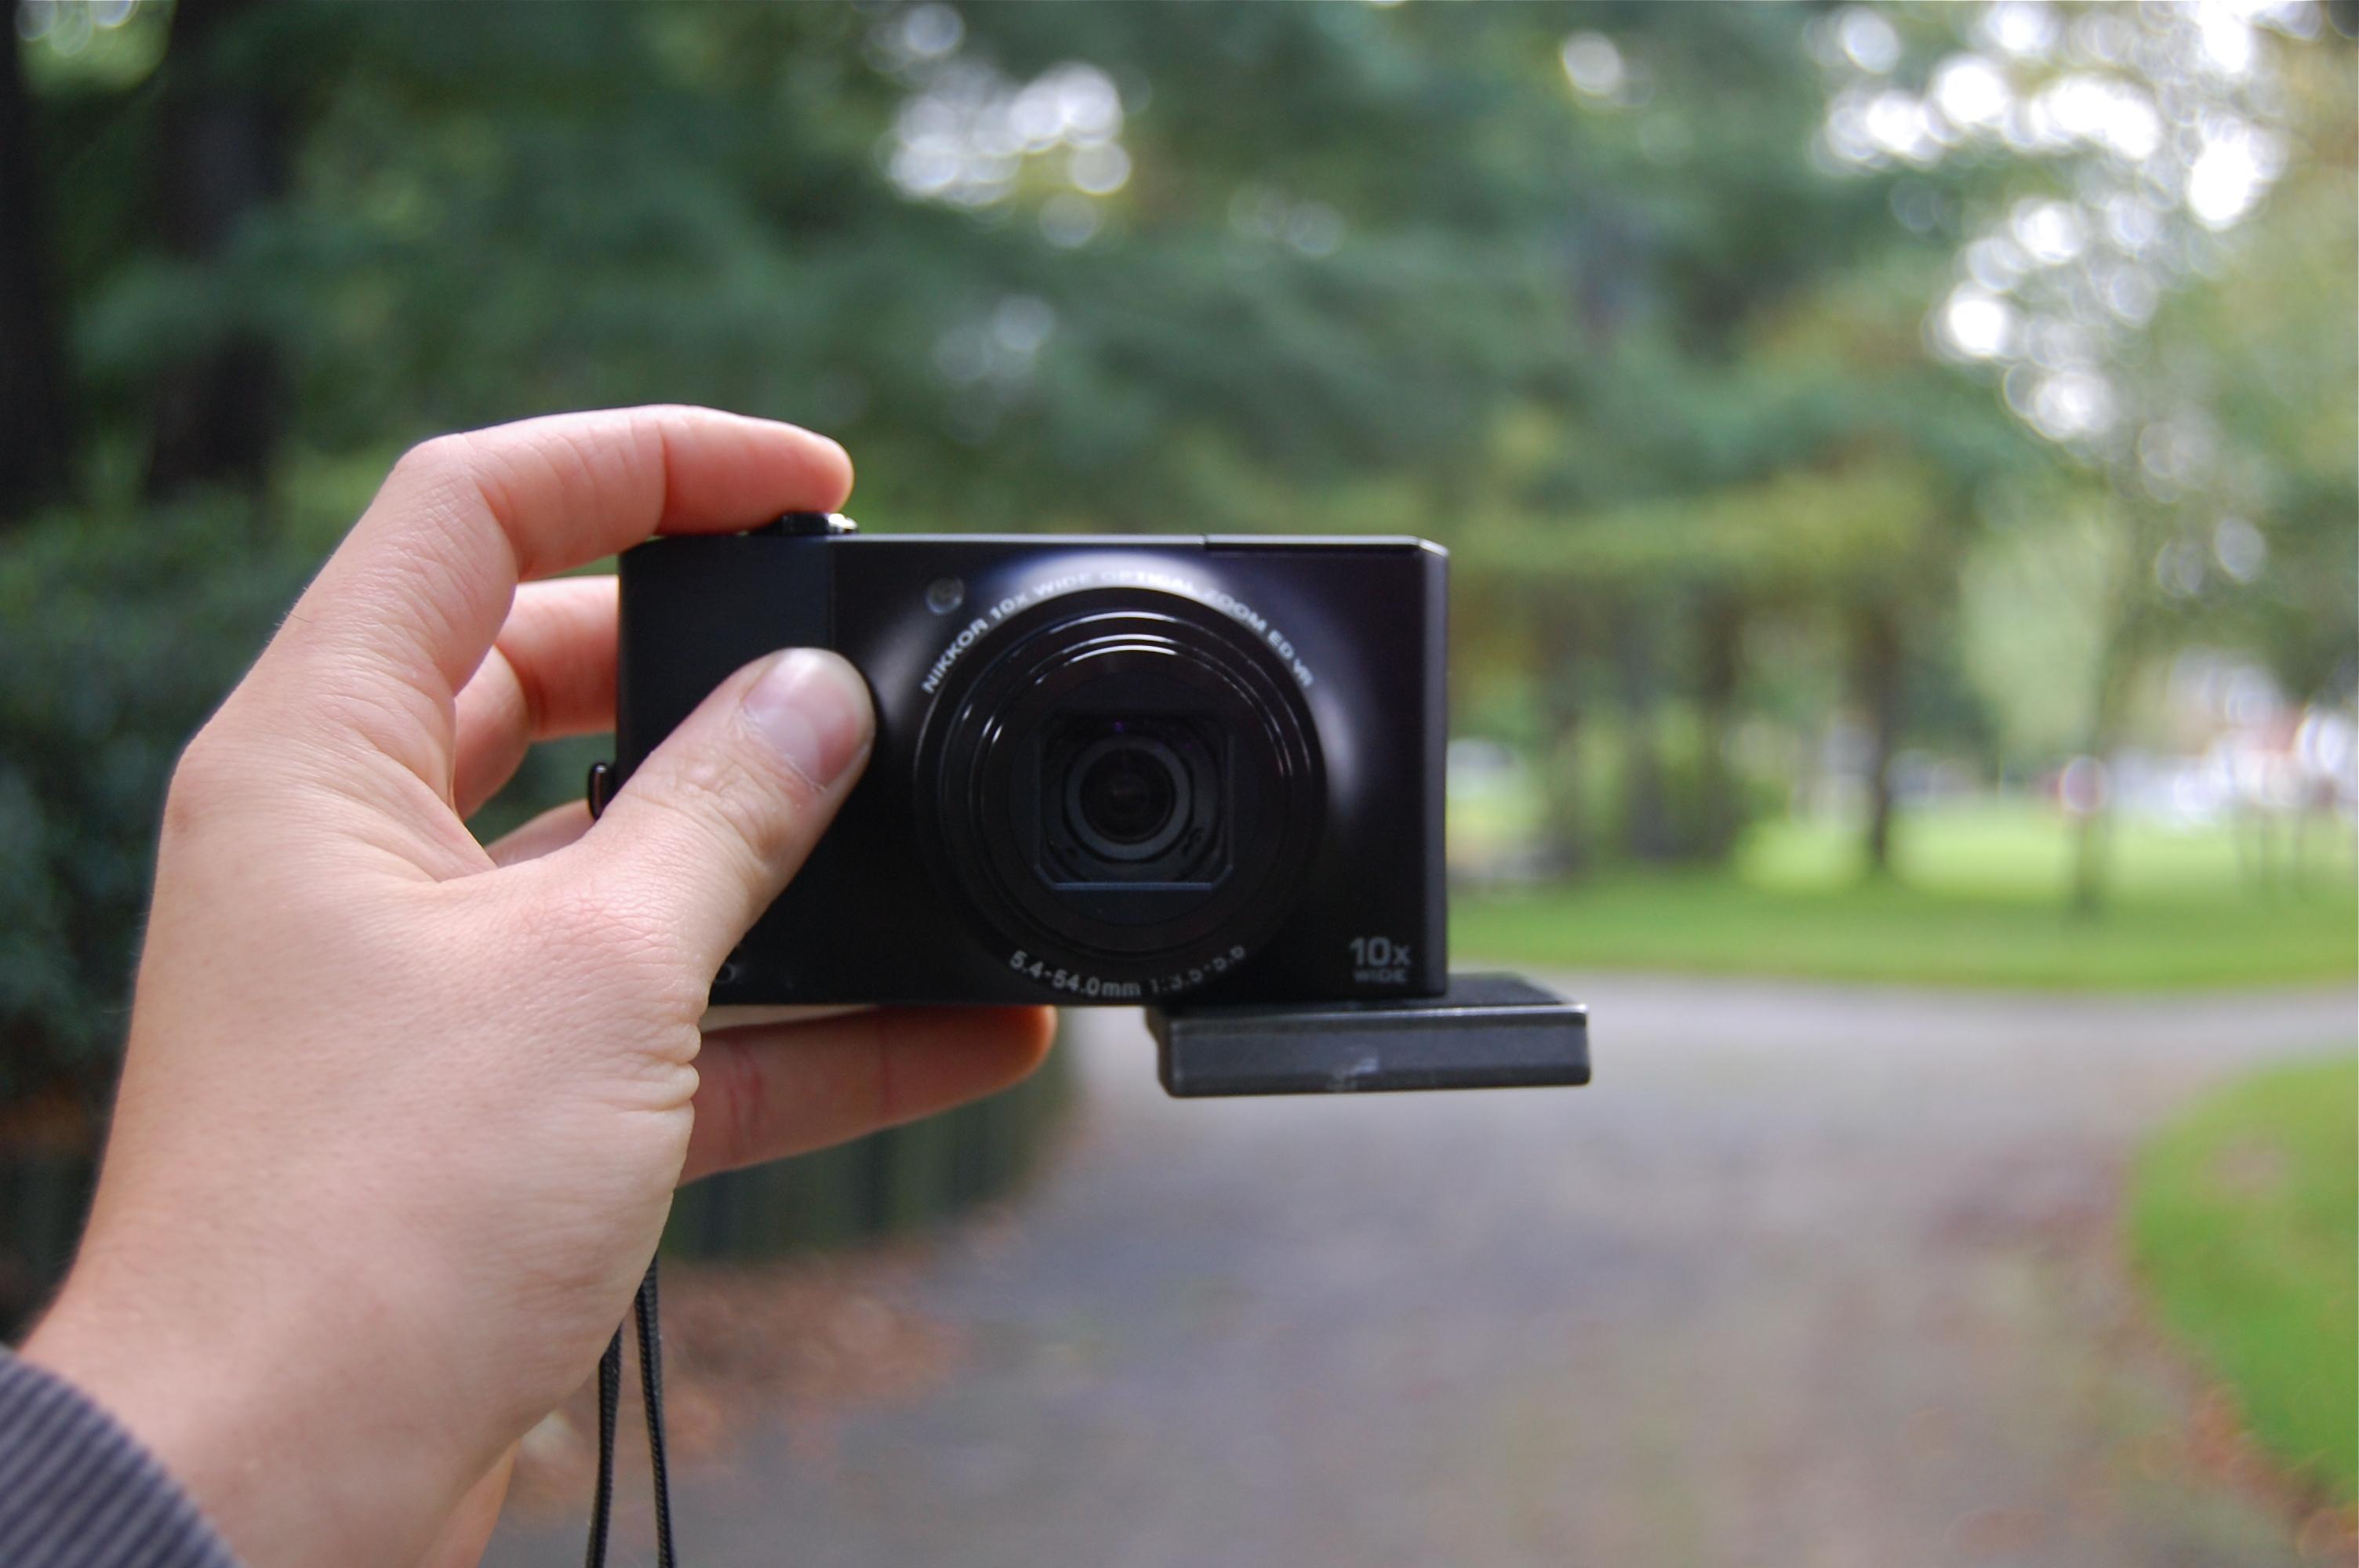 street photography ideas and tips street art photography rules street photography